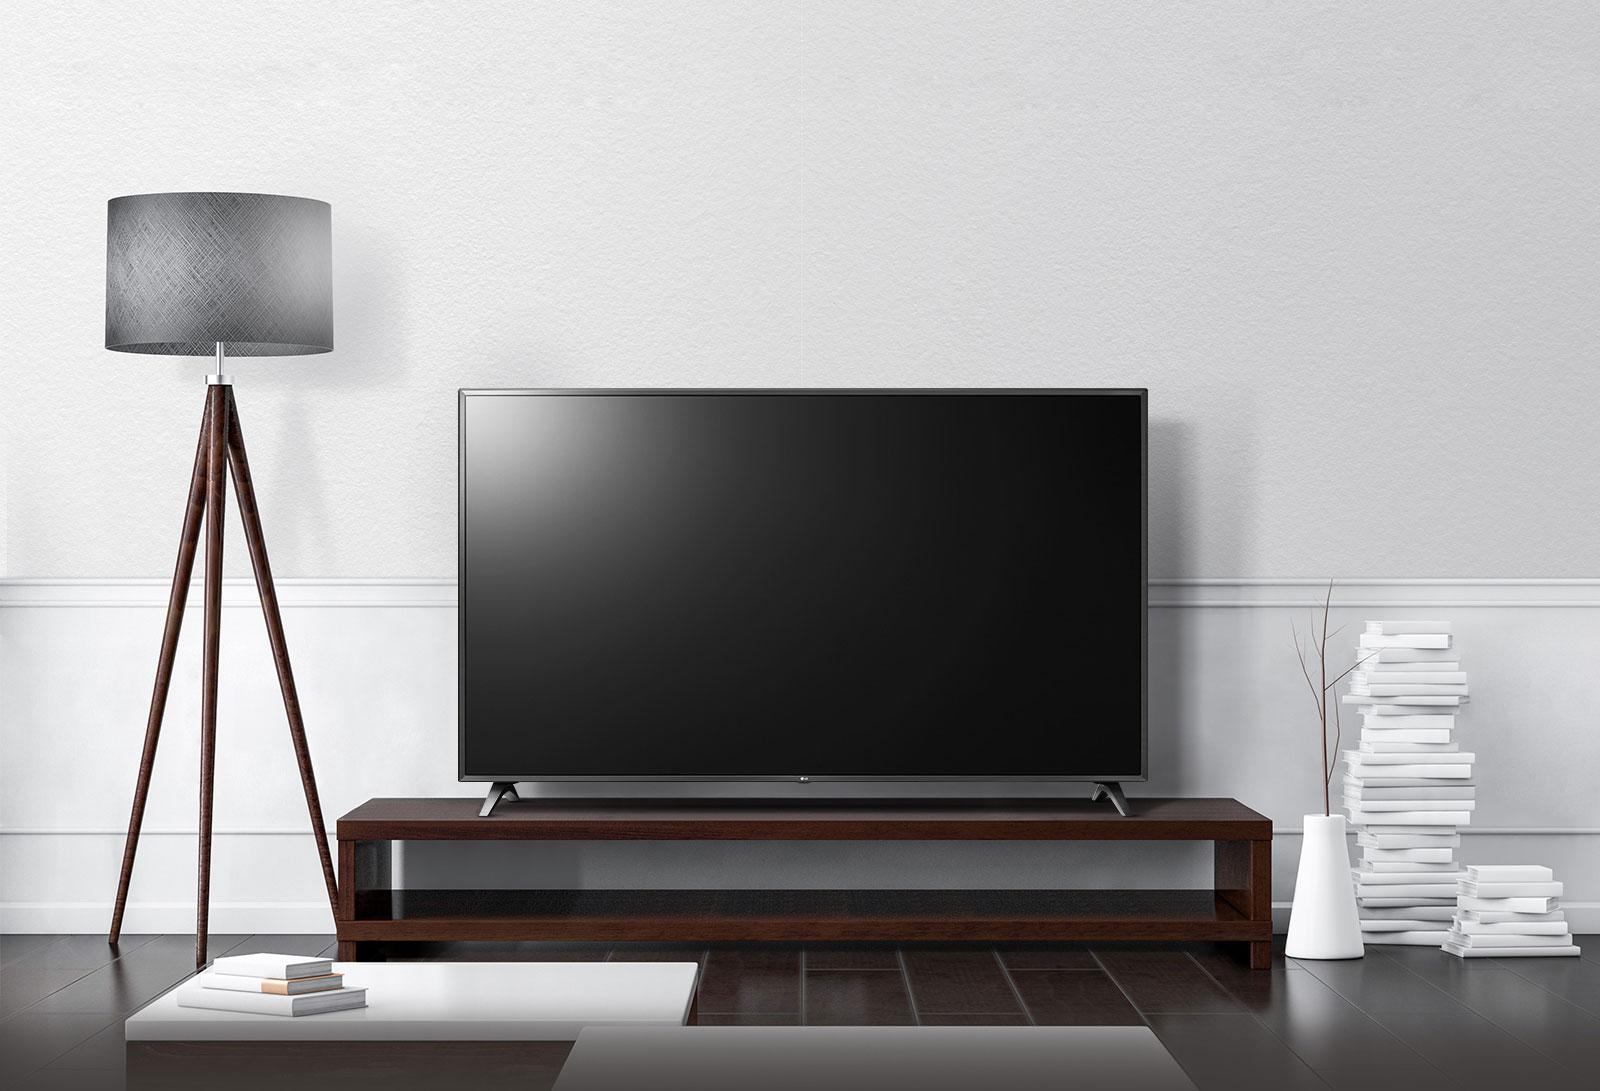 TV-UHD-49-UM73-07-Design-Desktop